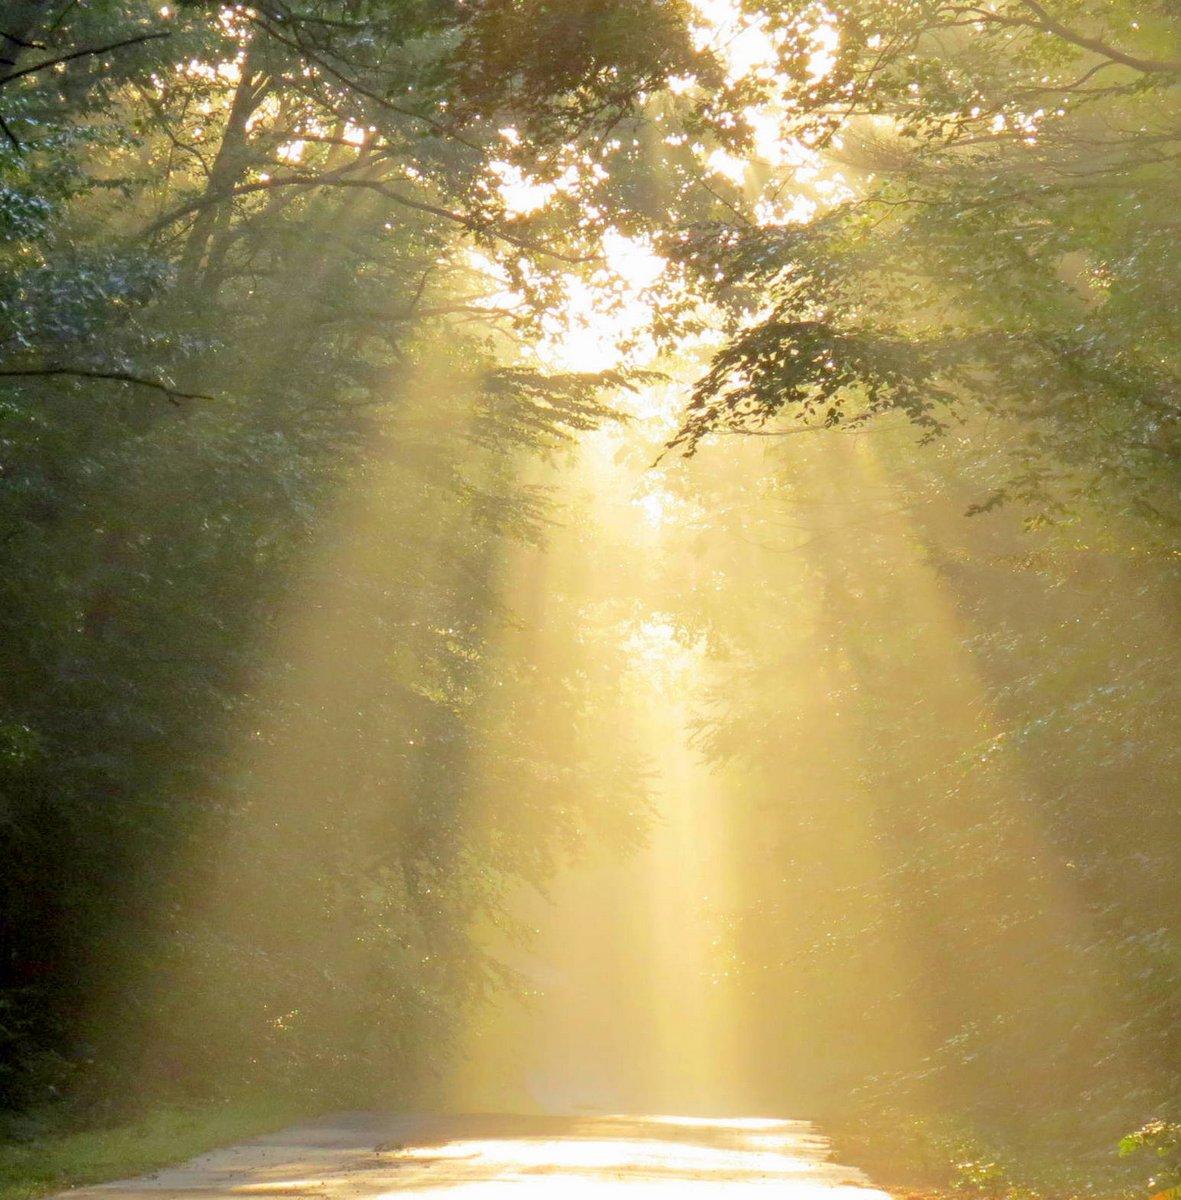 2. Sun Through the Trees